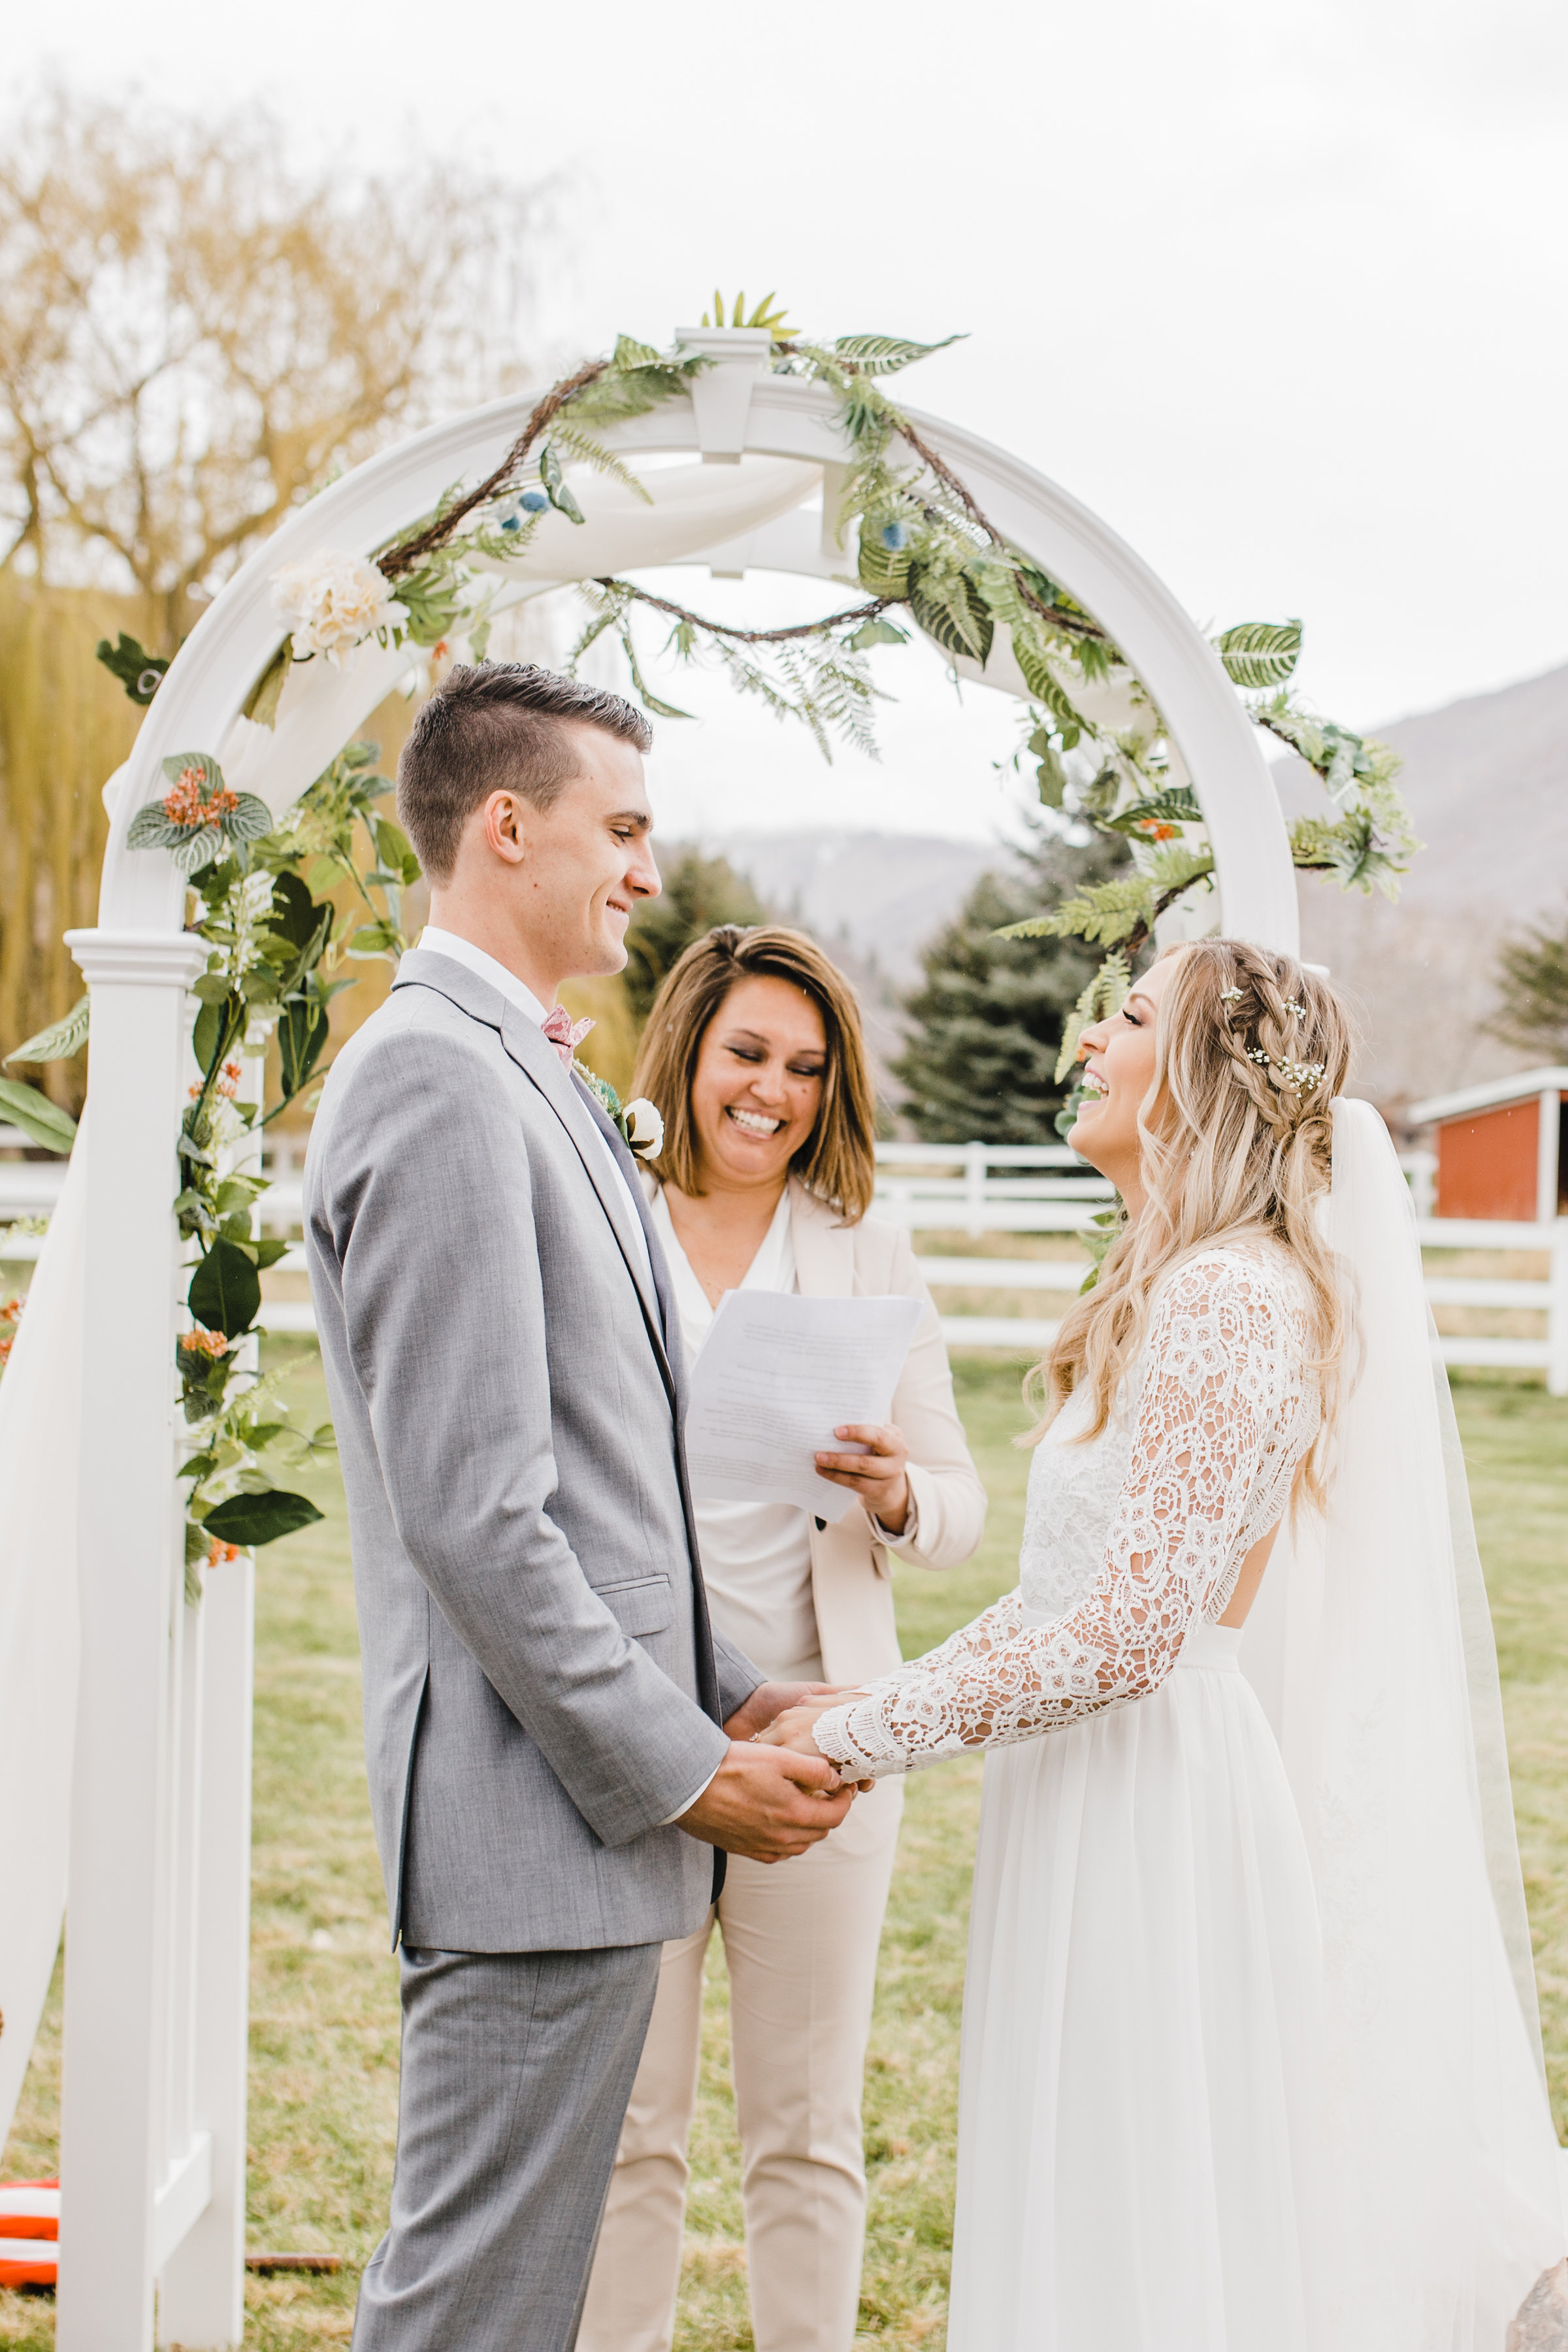 northern colorado wedding photographer boulder co calli richards bride and groom outdoor wedding ceremony